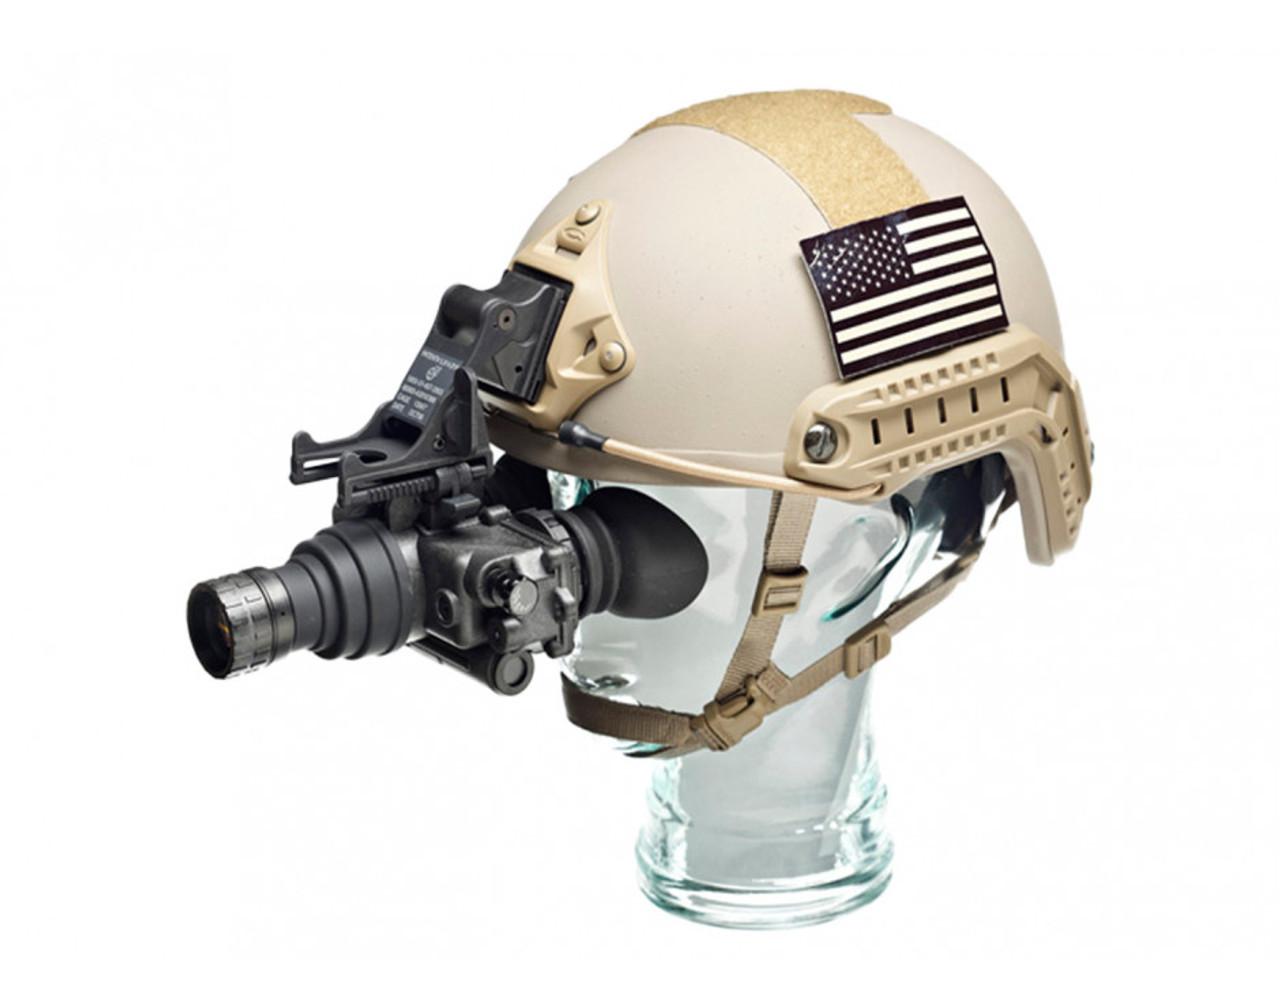 "AGM PVS-7 3NL3 Night Vision Goggle Gen 3 ""Level 3"" (AGM PVS-7 3NL3)"